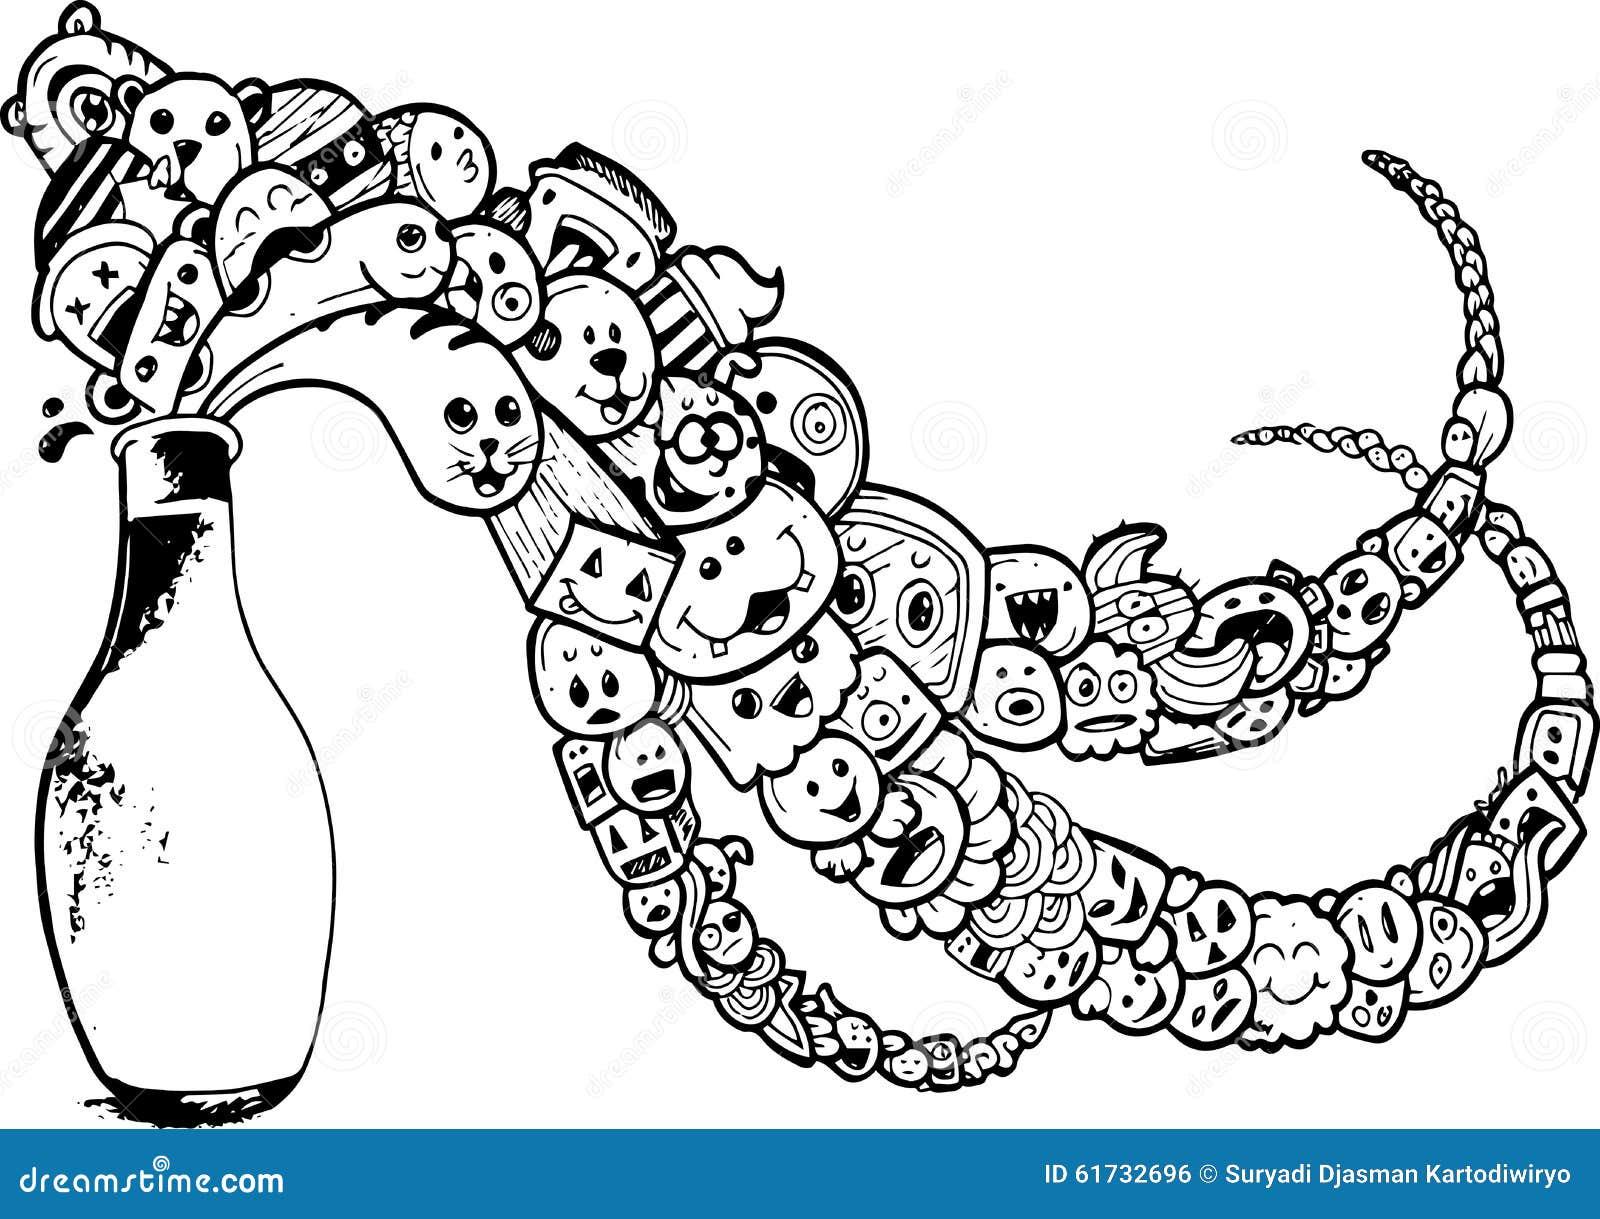 Black And White Line Art : Black and white line drawing stock illustration image